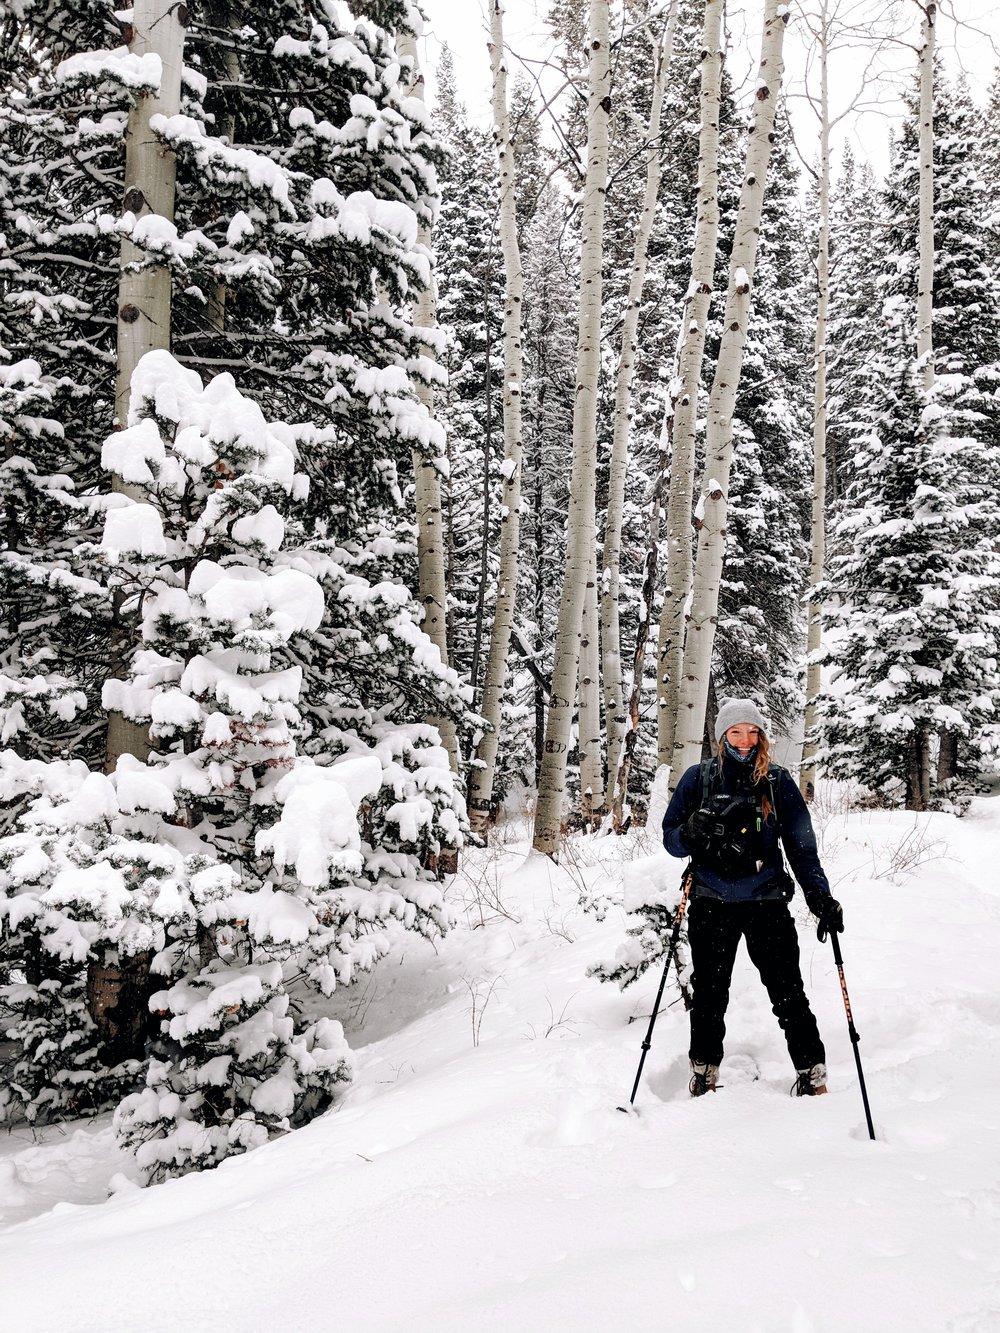 Our fearless leader for snowshoeing!  Photos taken on Google Pixel 3  Park City, Utah #TeamPixel